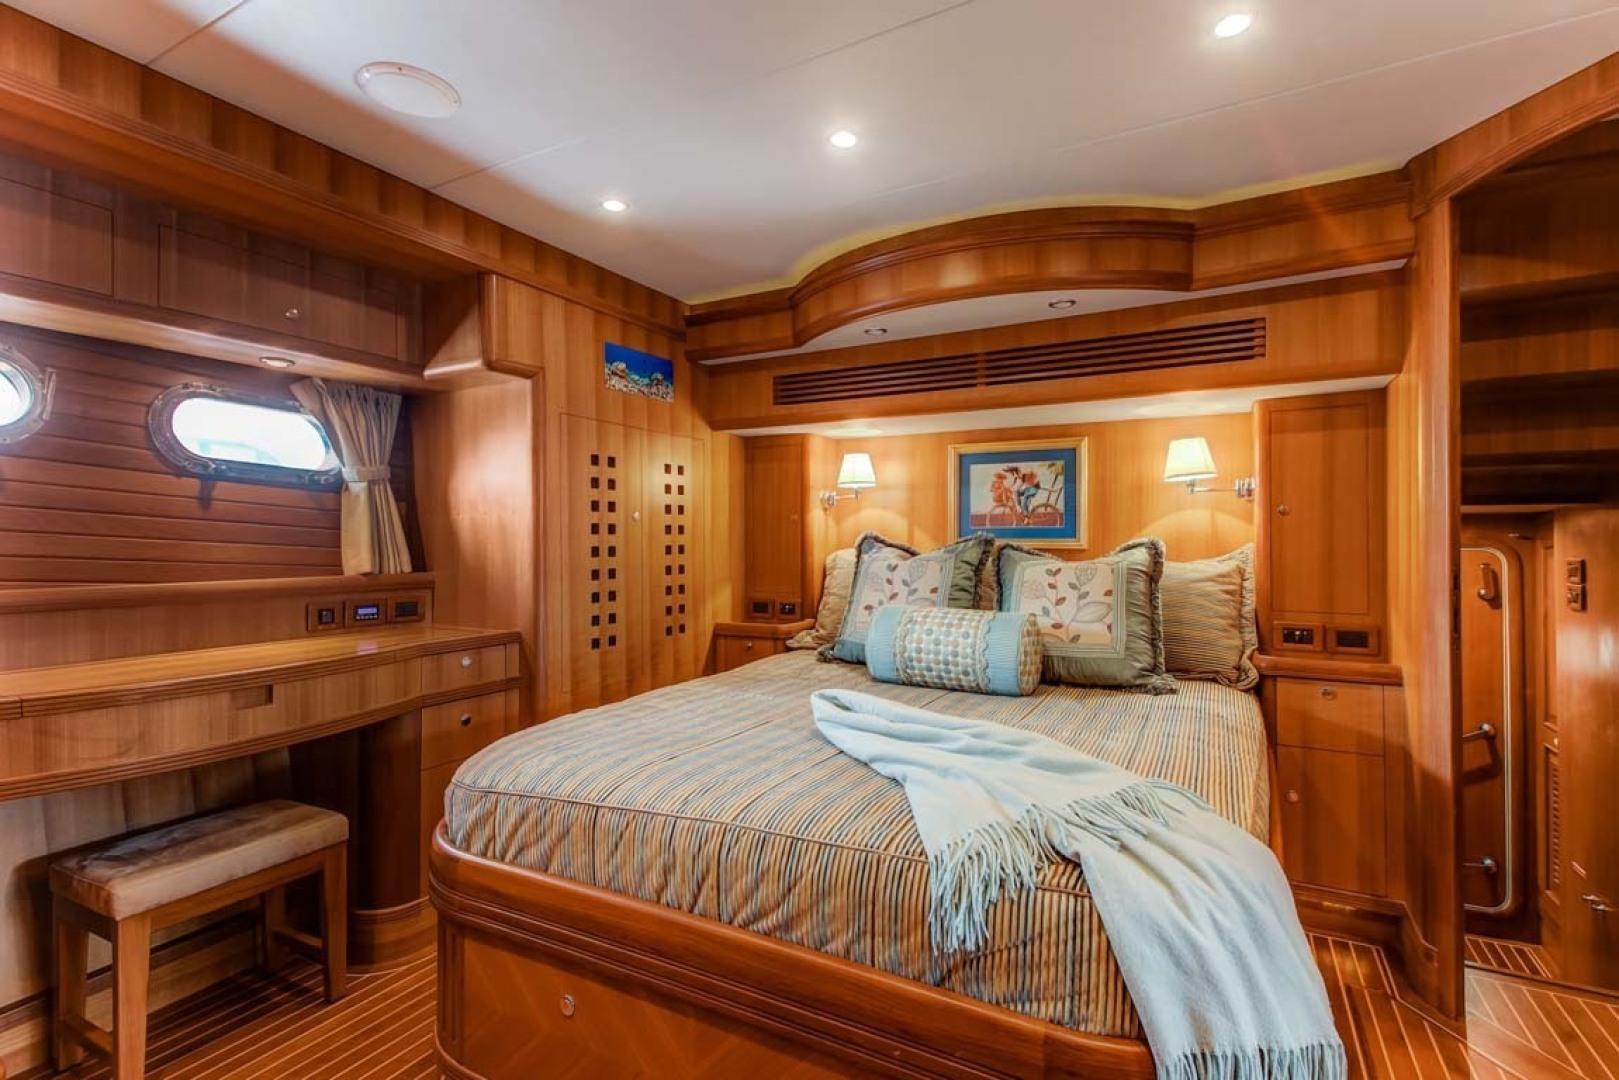 Selene-60 Ocean Trawler 2010-Gypsy Magic Jacksonville-Florida-United States-Master Stateroom-1346748   Thumbnail